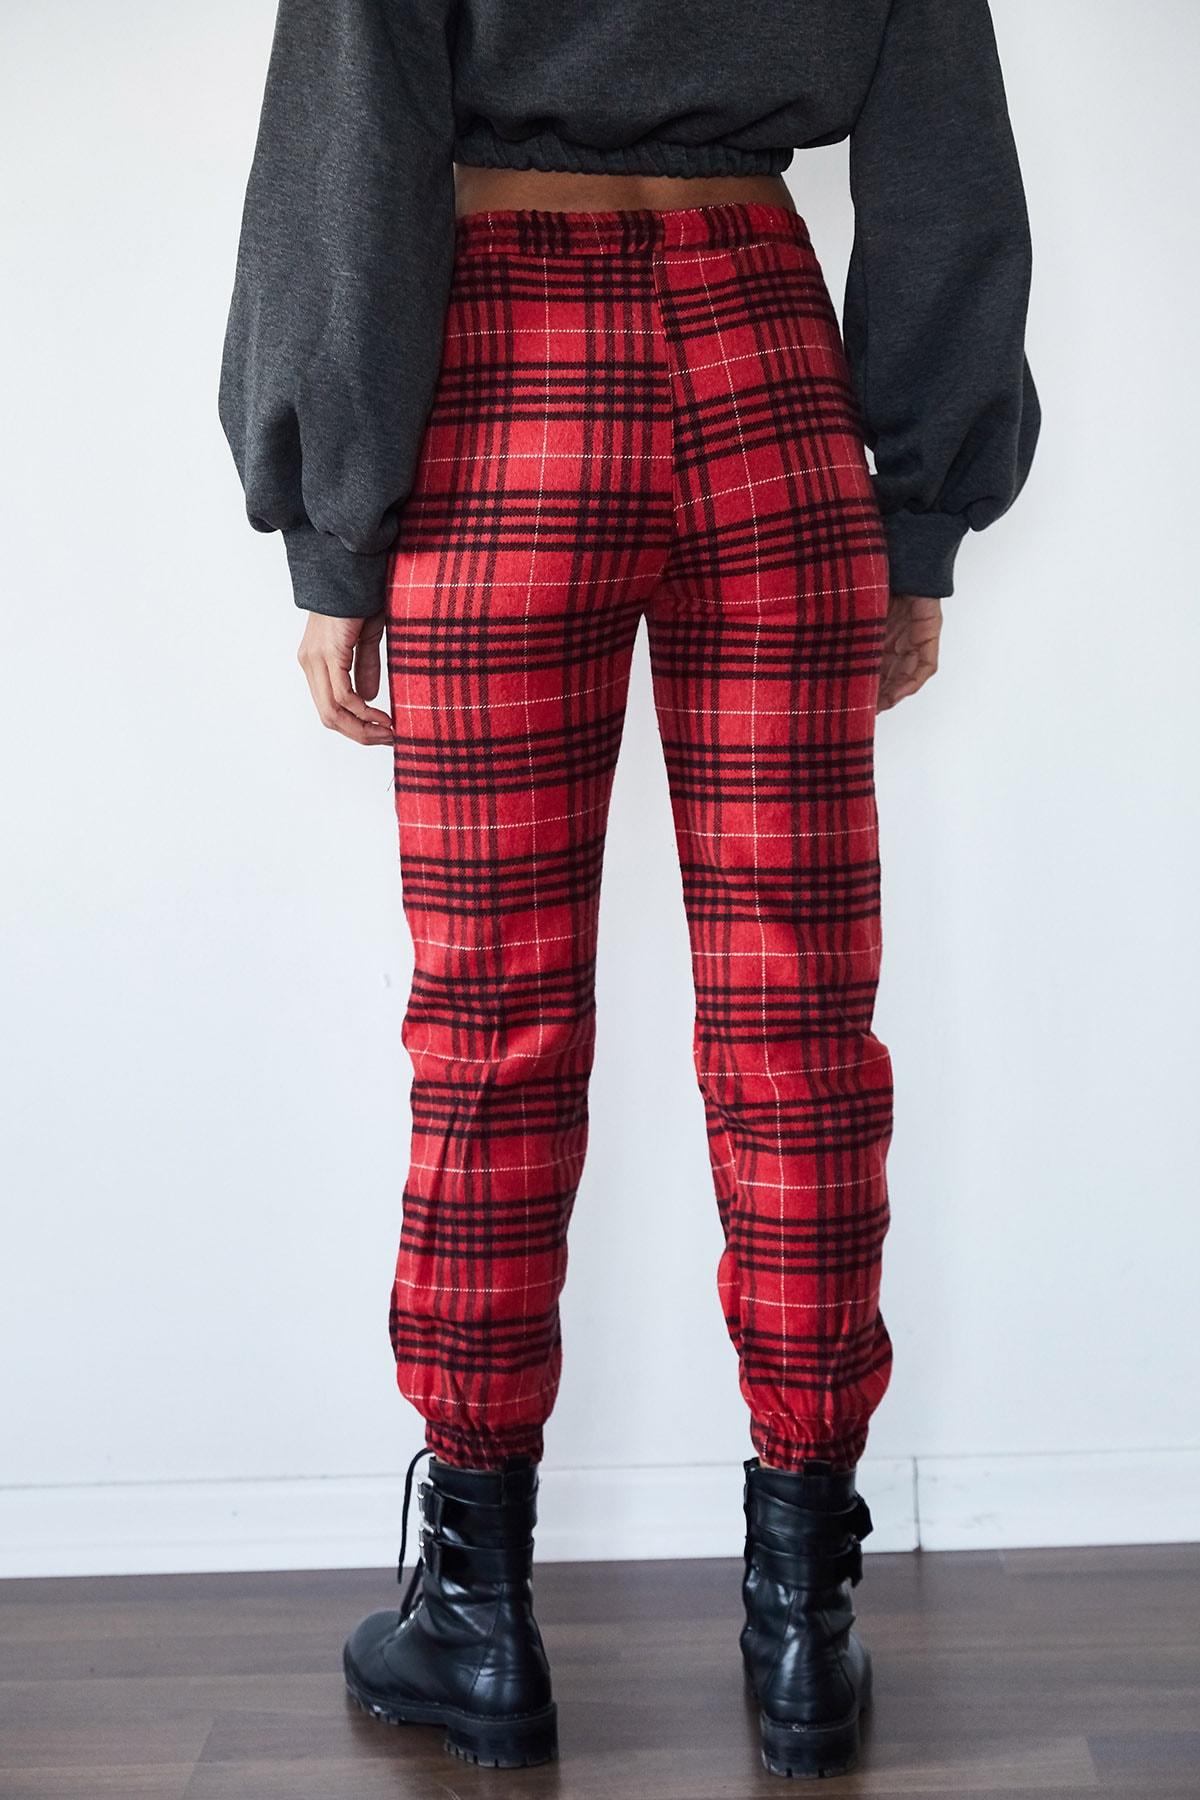 Xena Kadın Kırmızı Kaşe Jogger Pantolon 1KZK8-11234-04